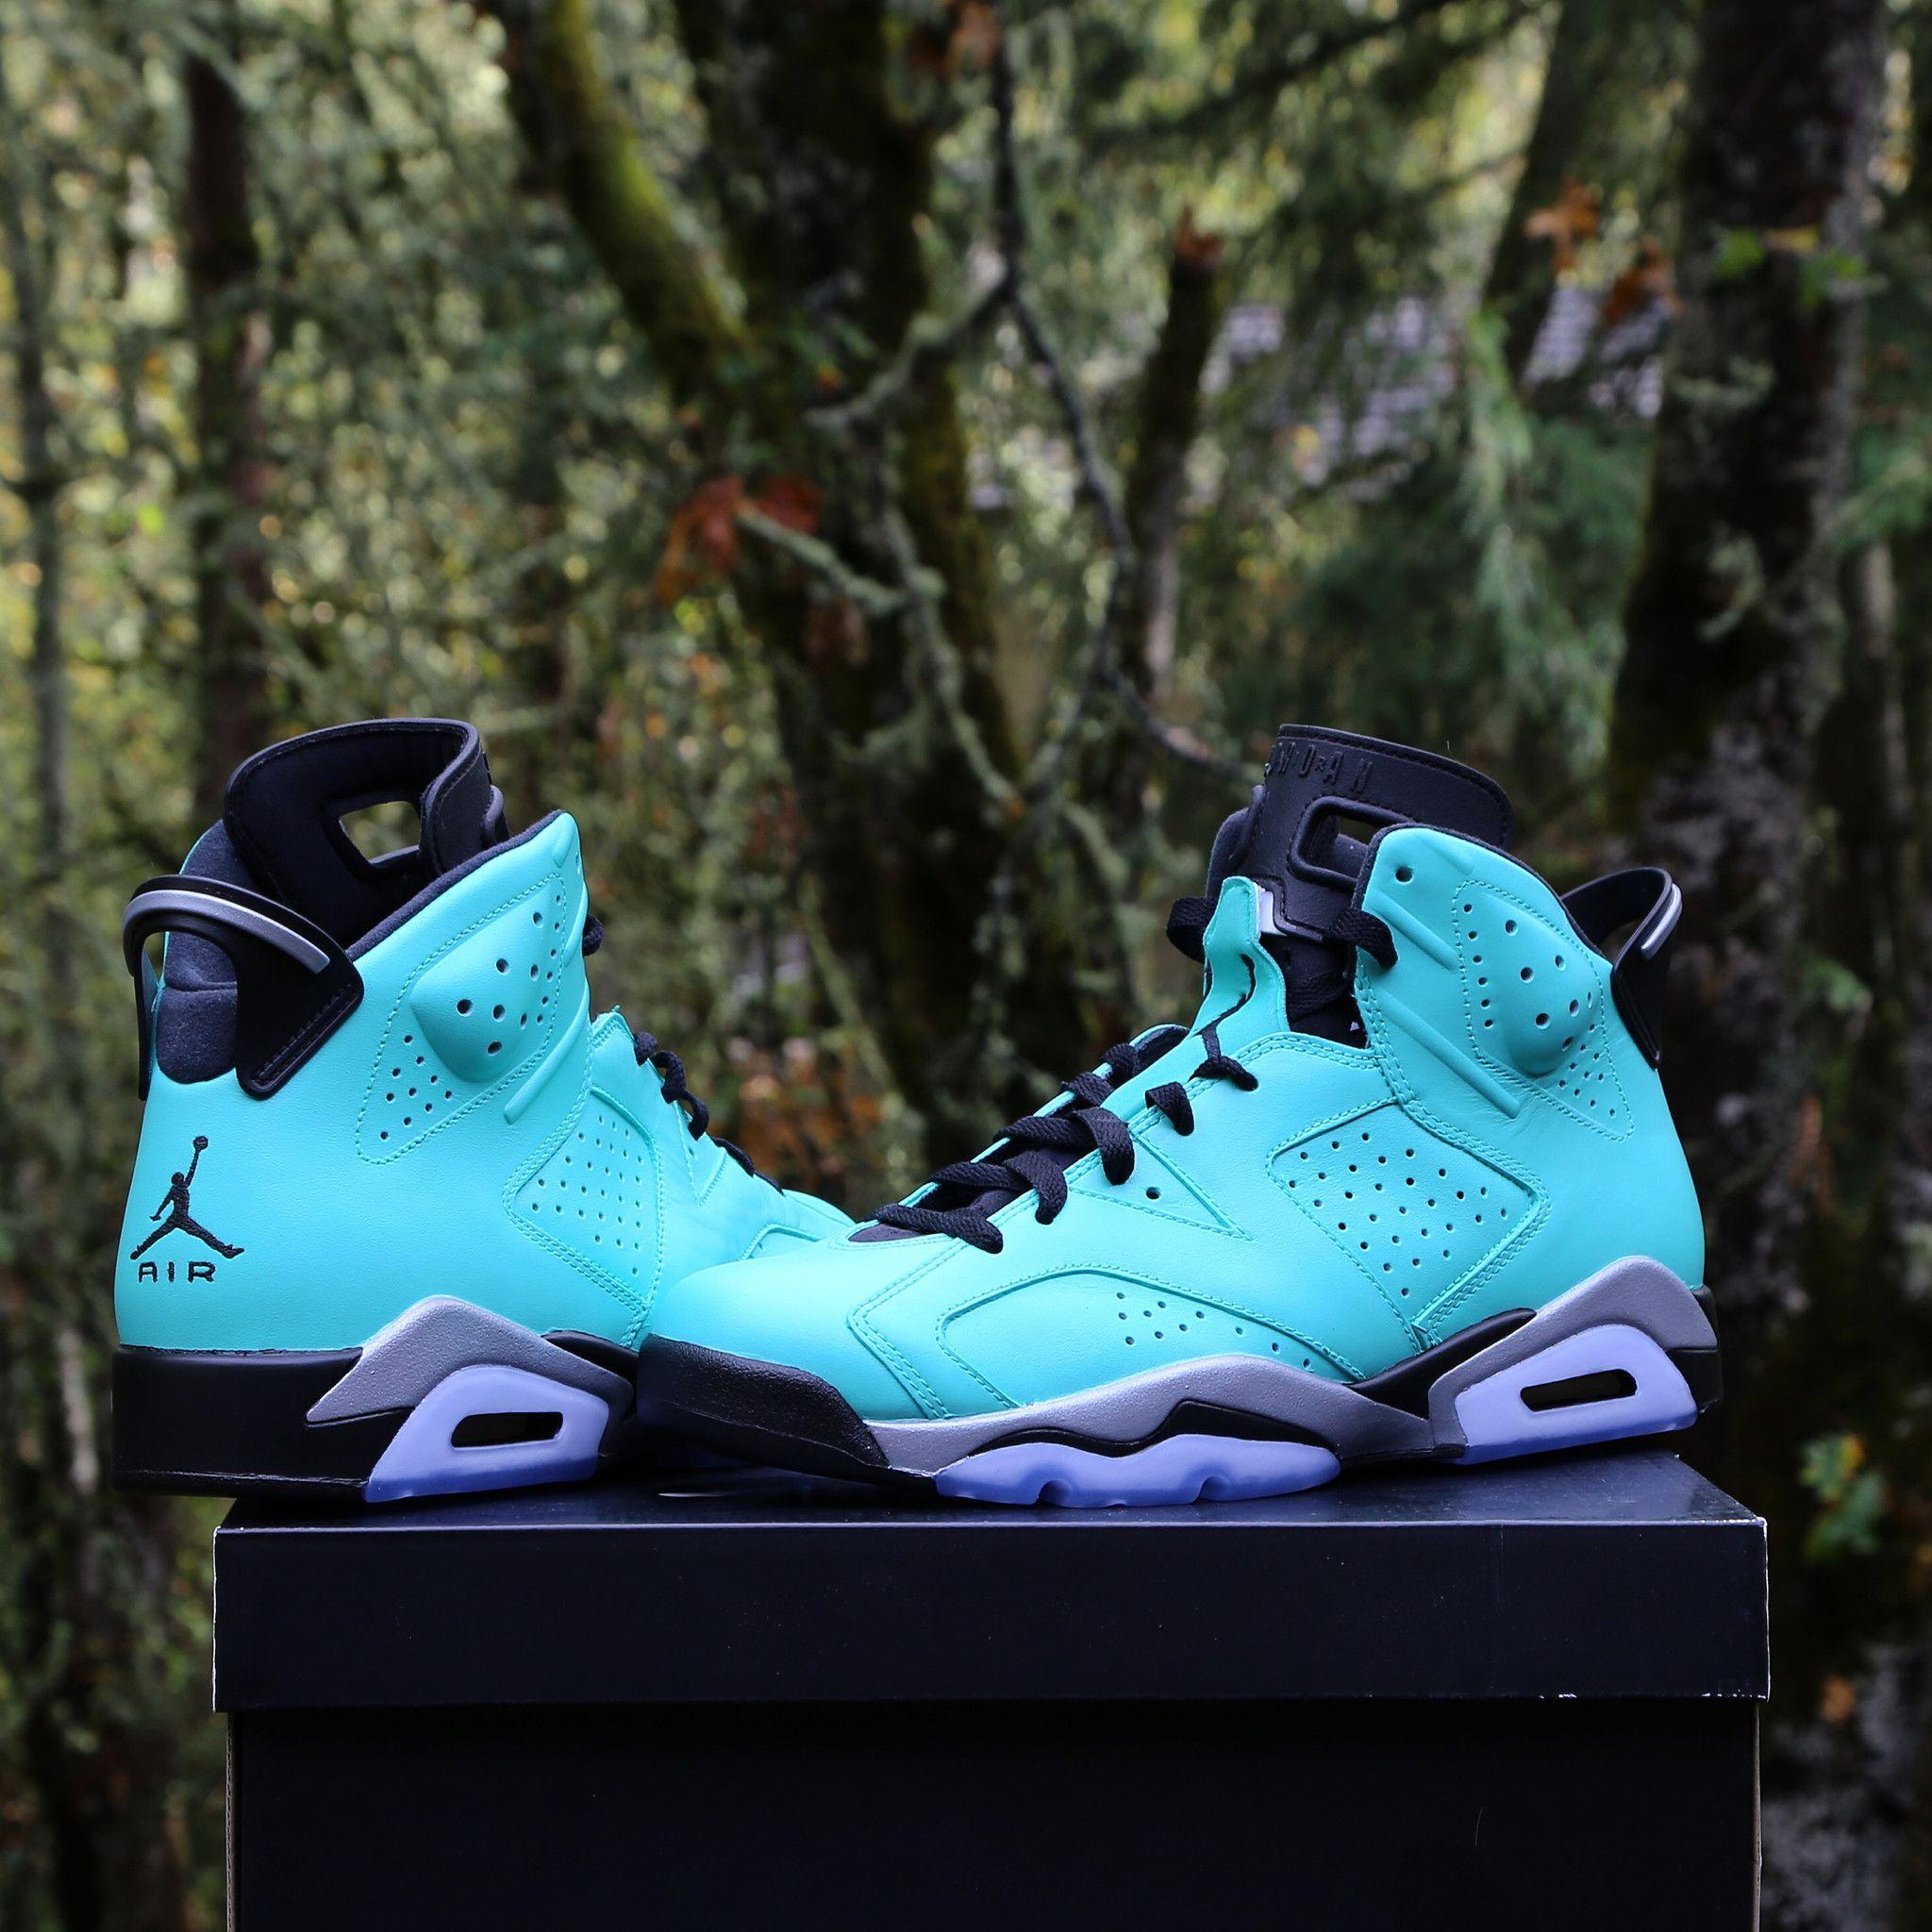 Air Jordan Retro 6 Size 14